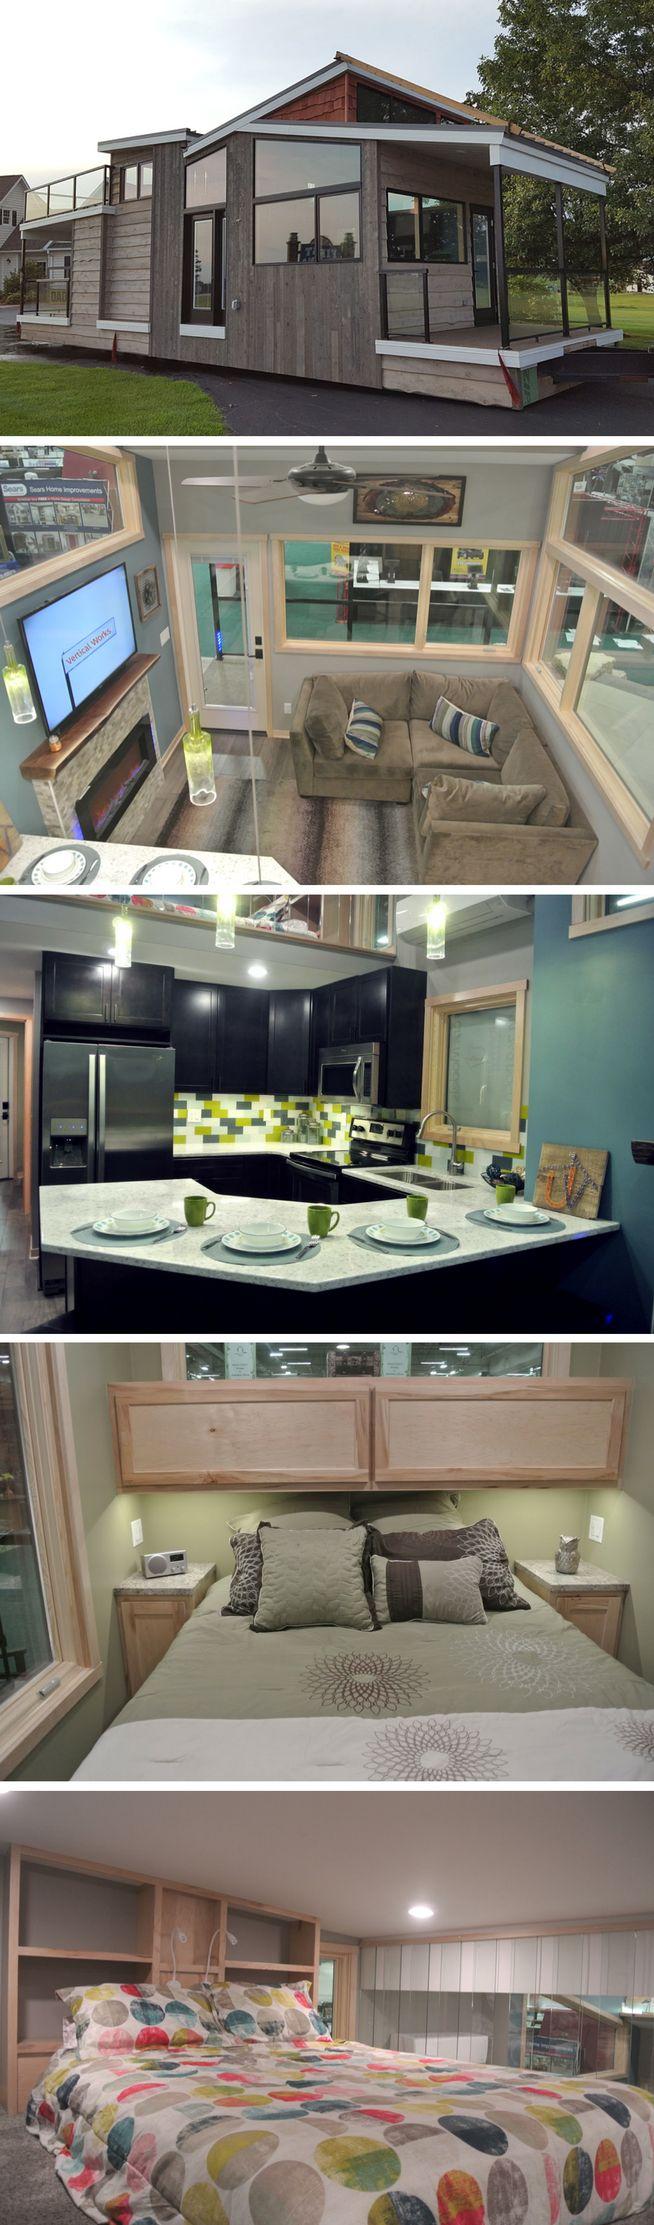 The Denali park model home from Utopian Villas (400 sq ft)